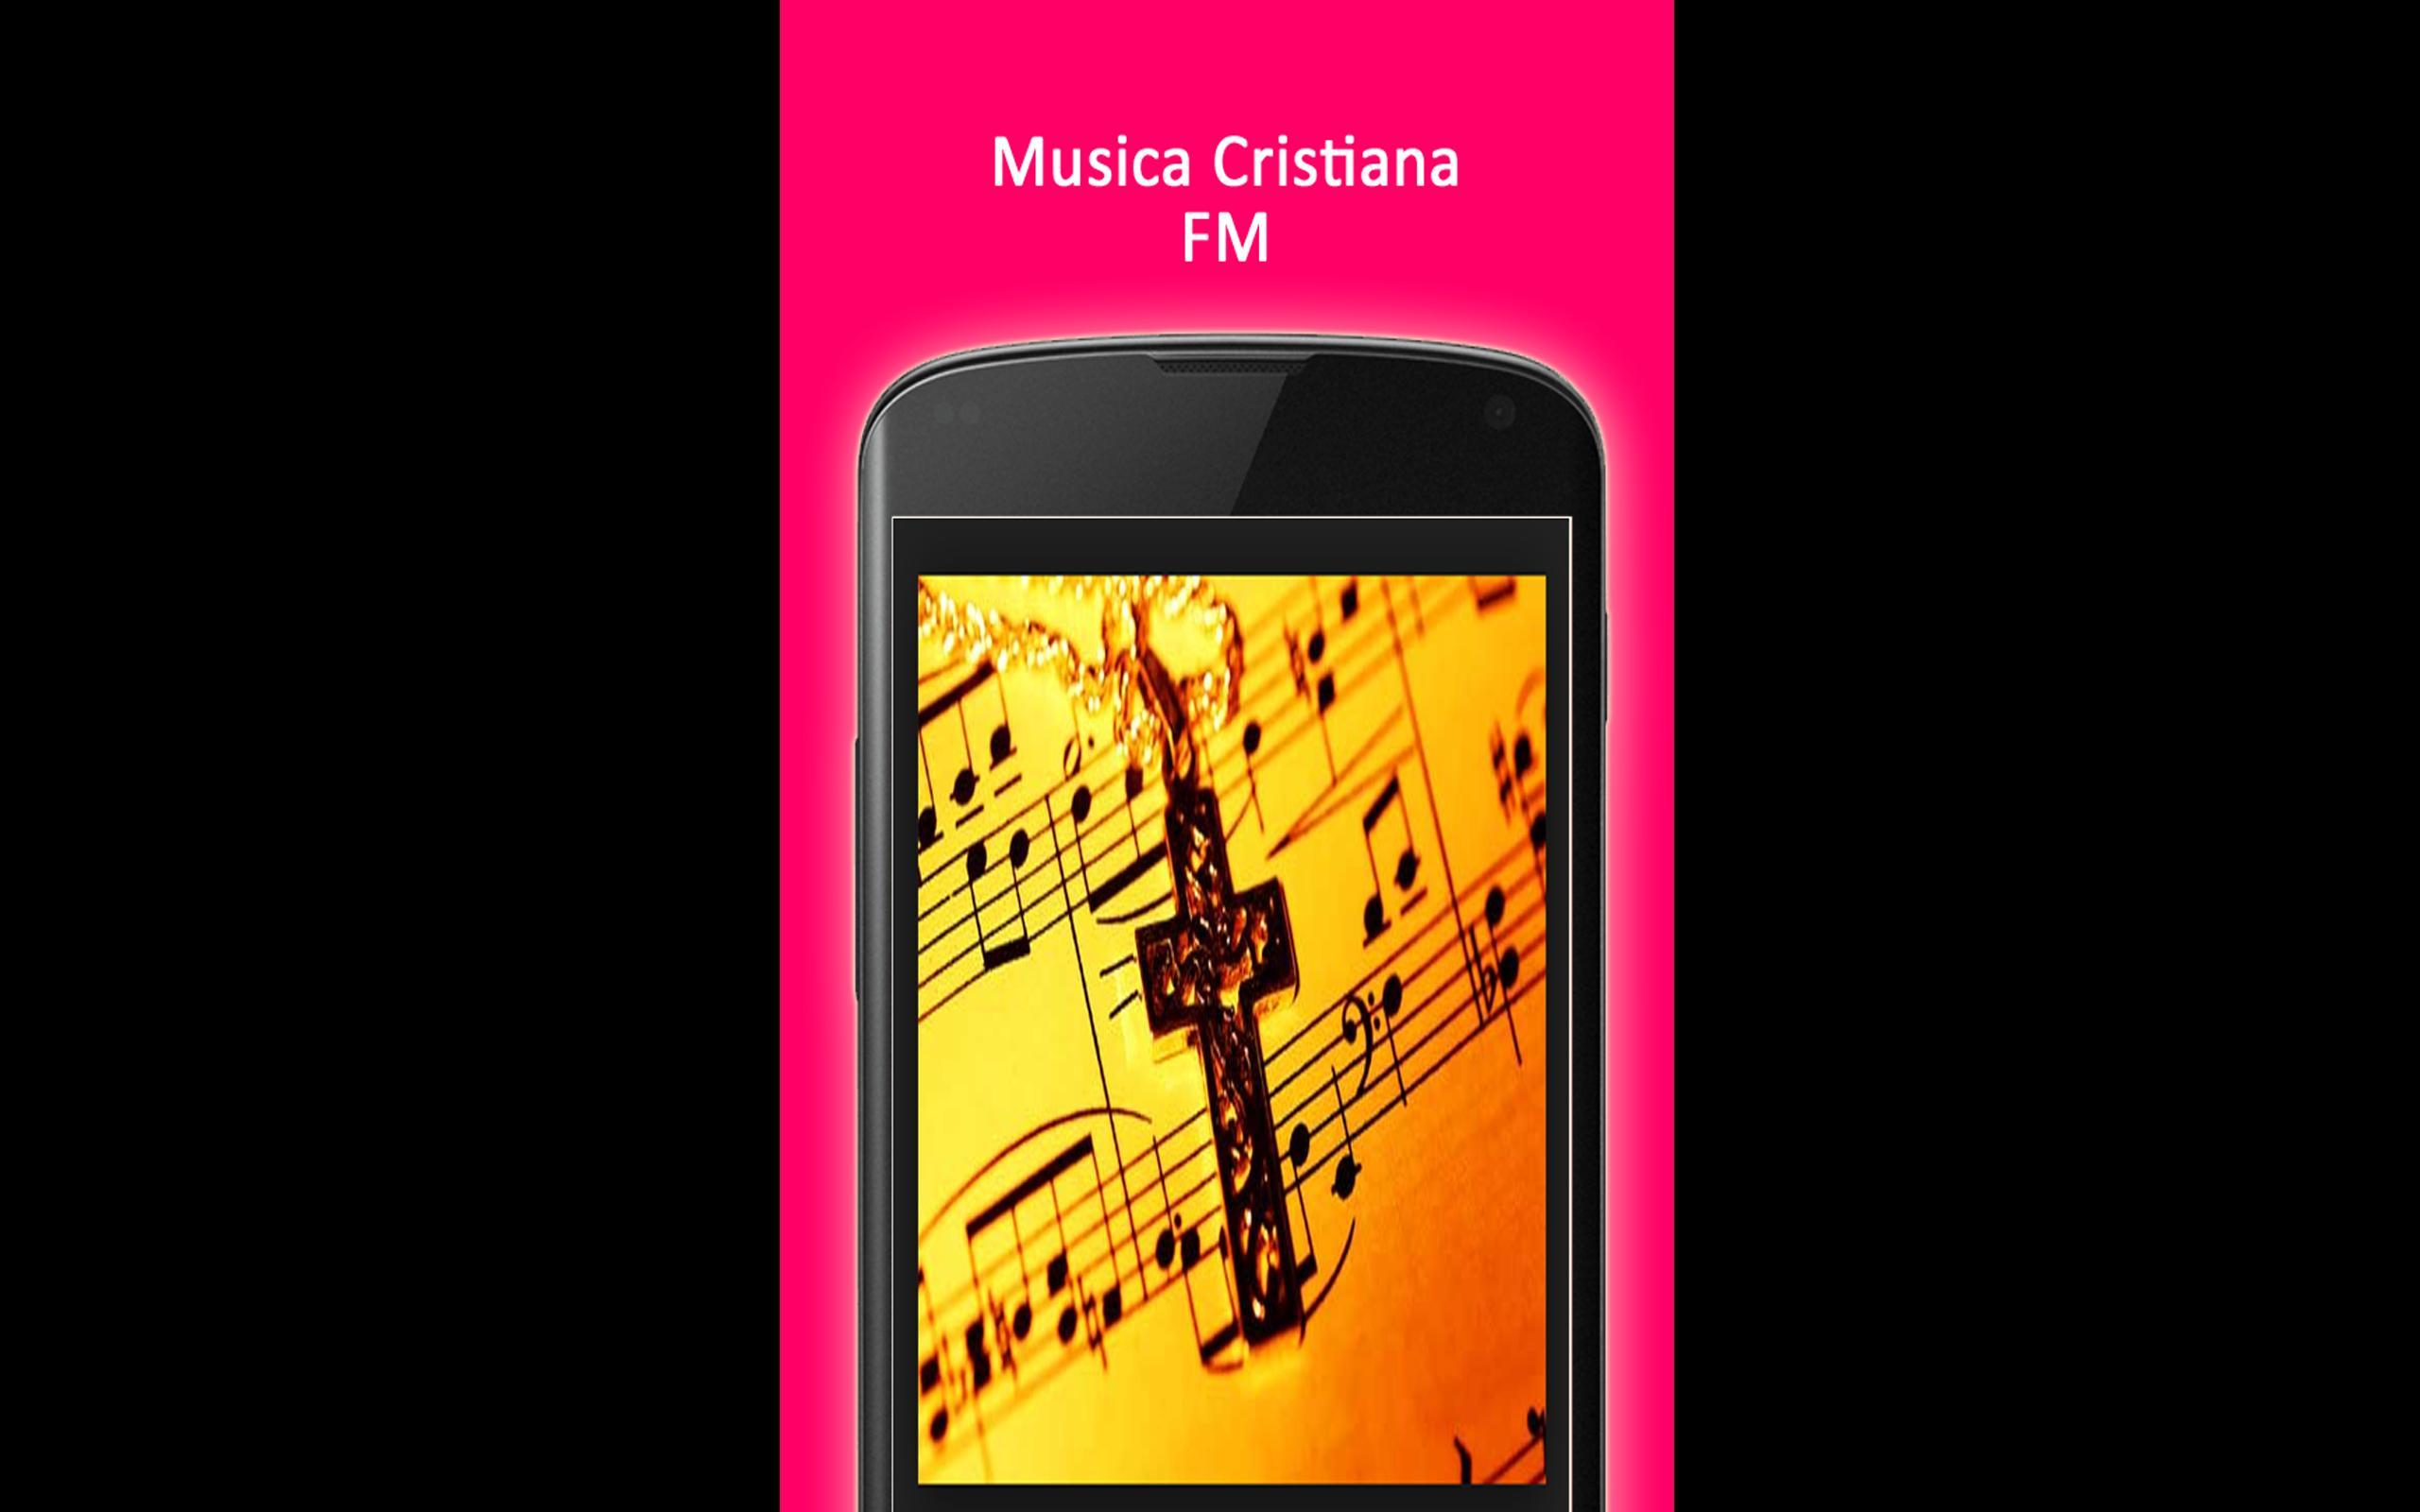 Alabanzas Cristianas De Adoracion alabanza de adoracion musica cristiana fm dios for android